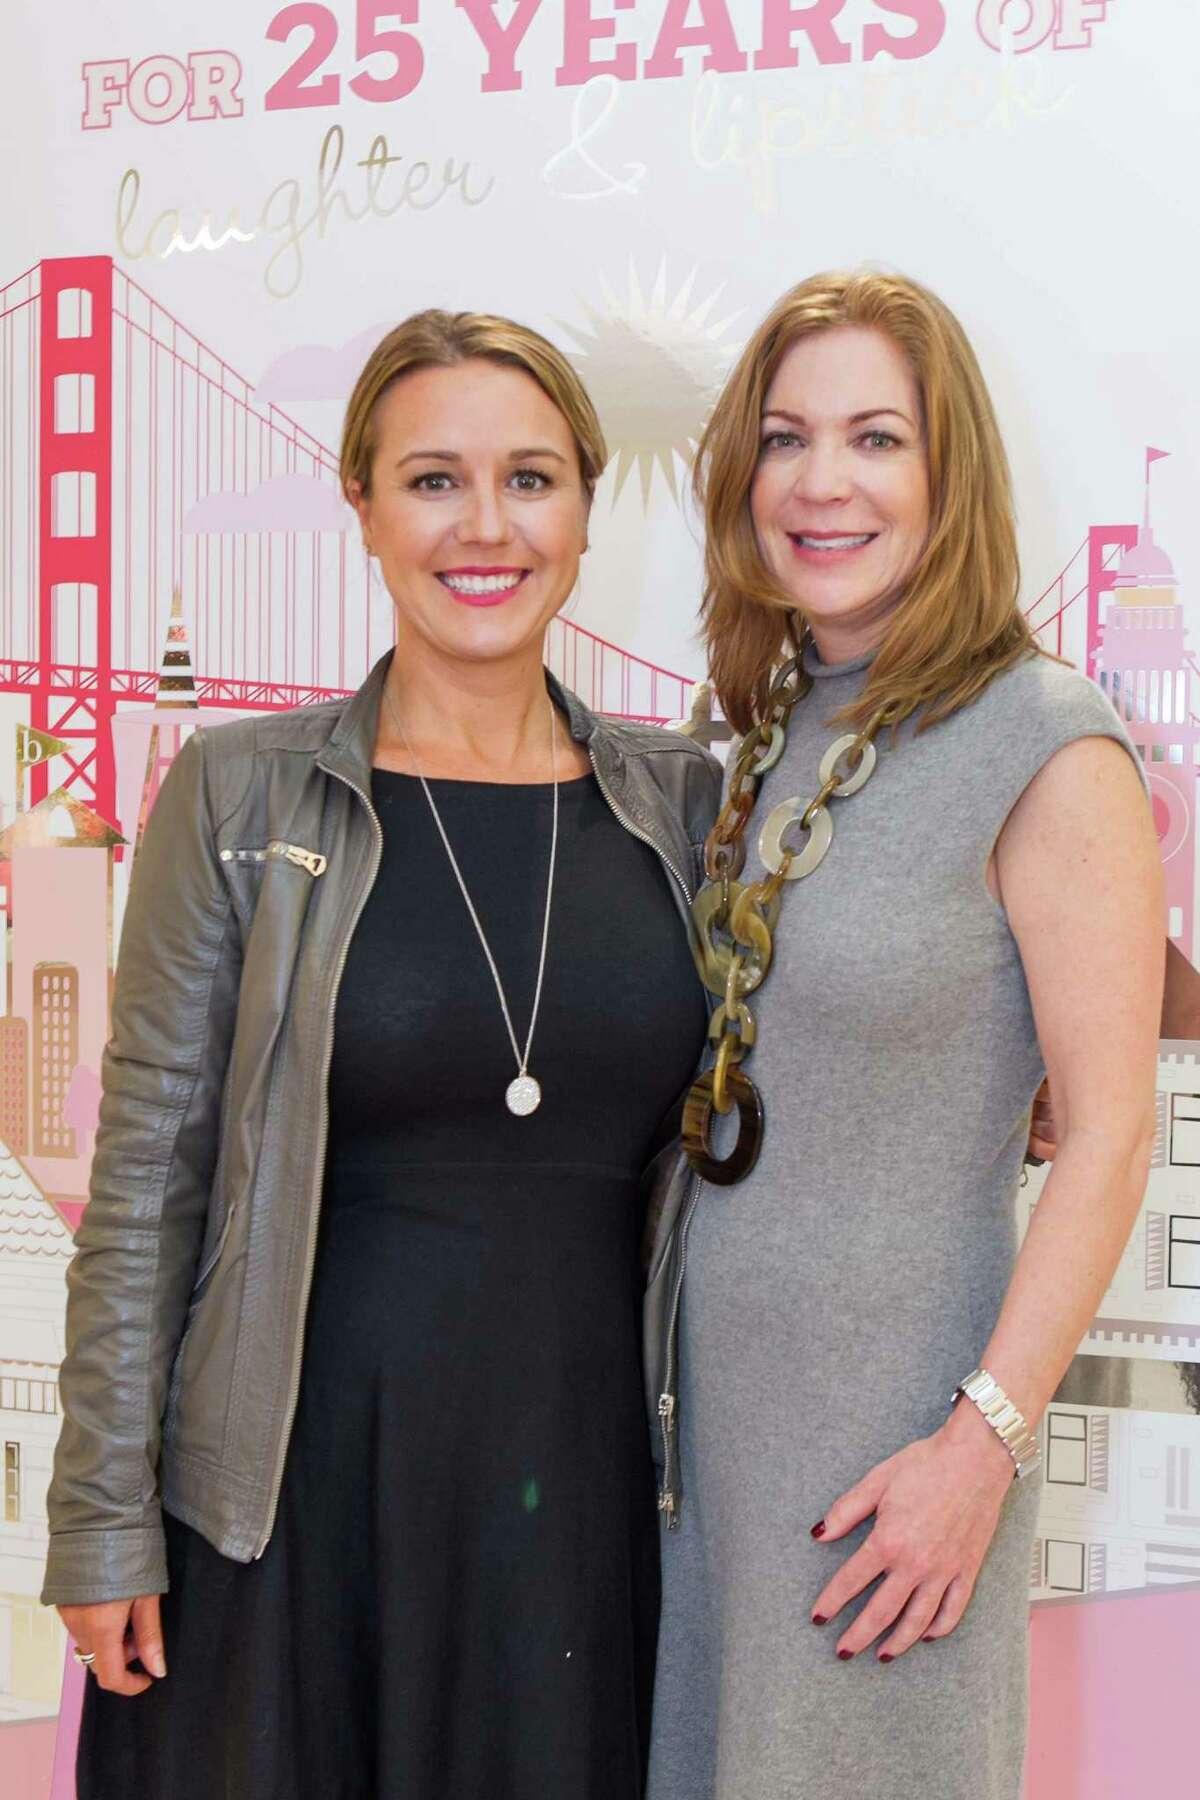 Megan Gordon and Lisa Edwards at the 25th anniversary celebration for Benefit Cosmetics' San francisco stores.